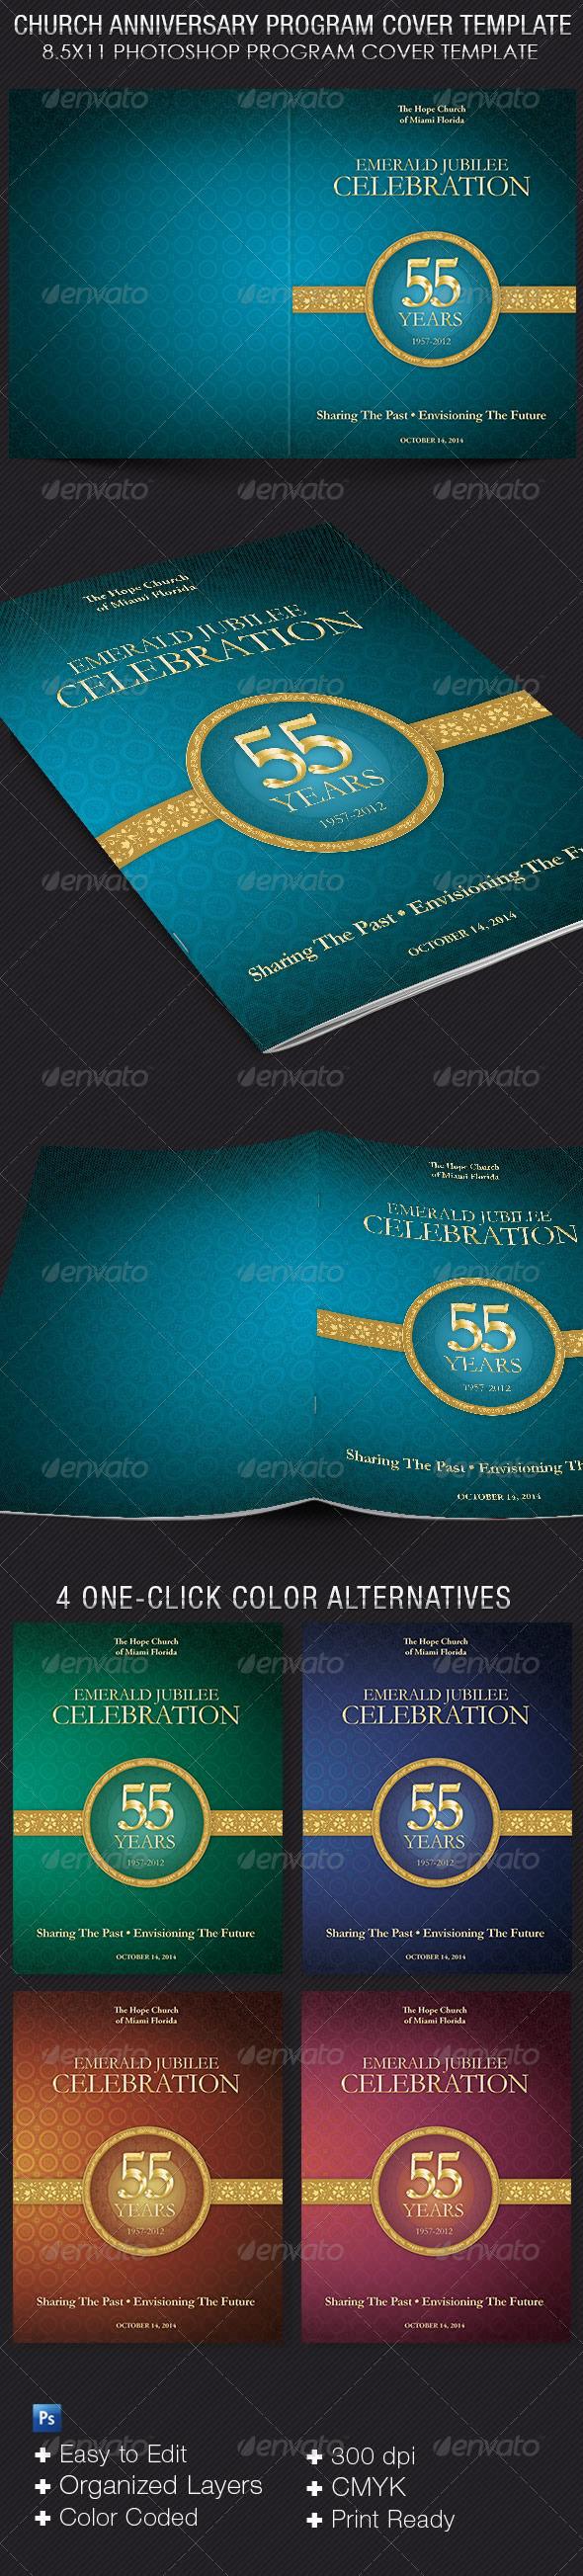 Church Anniversary Program Cover Template Graphicmule